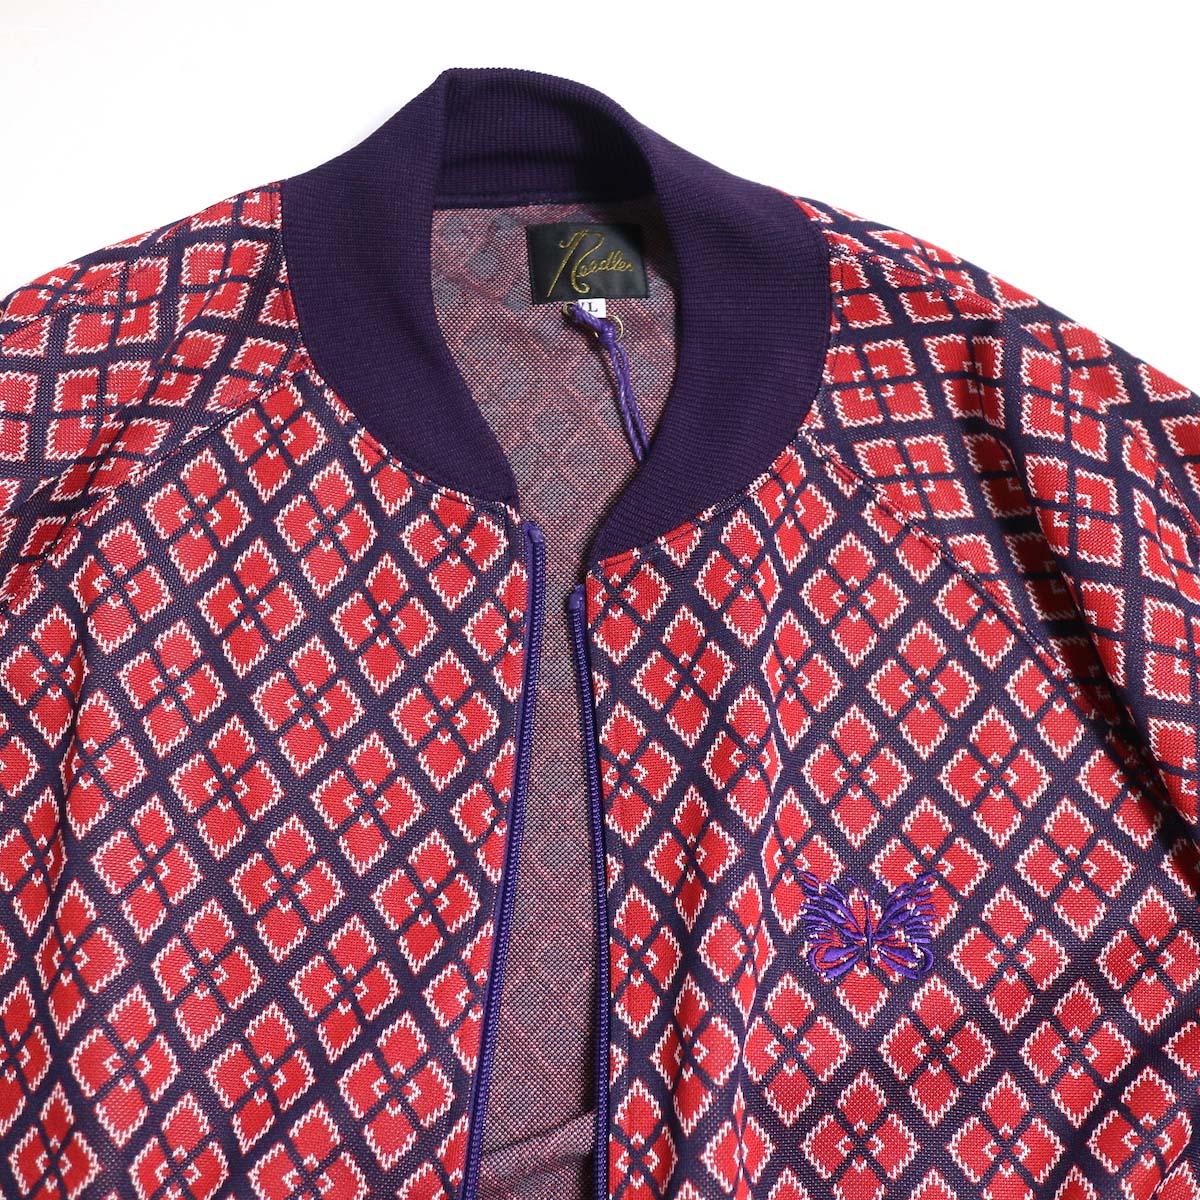 Needles / Rib Collar Track Jacket -Poly Jacquard (Diamond)リブカラー